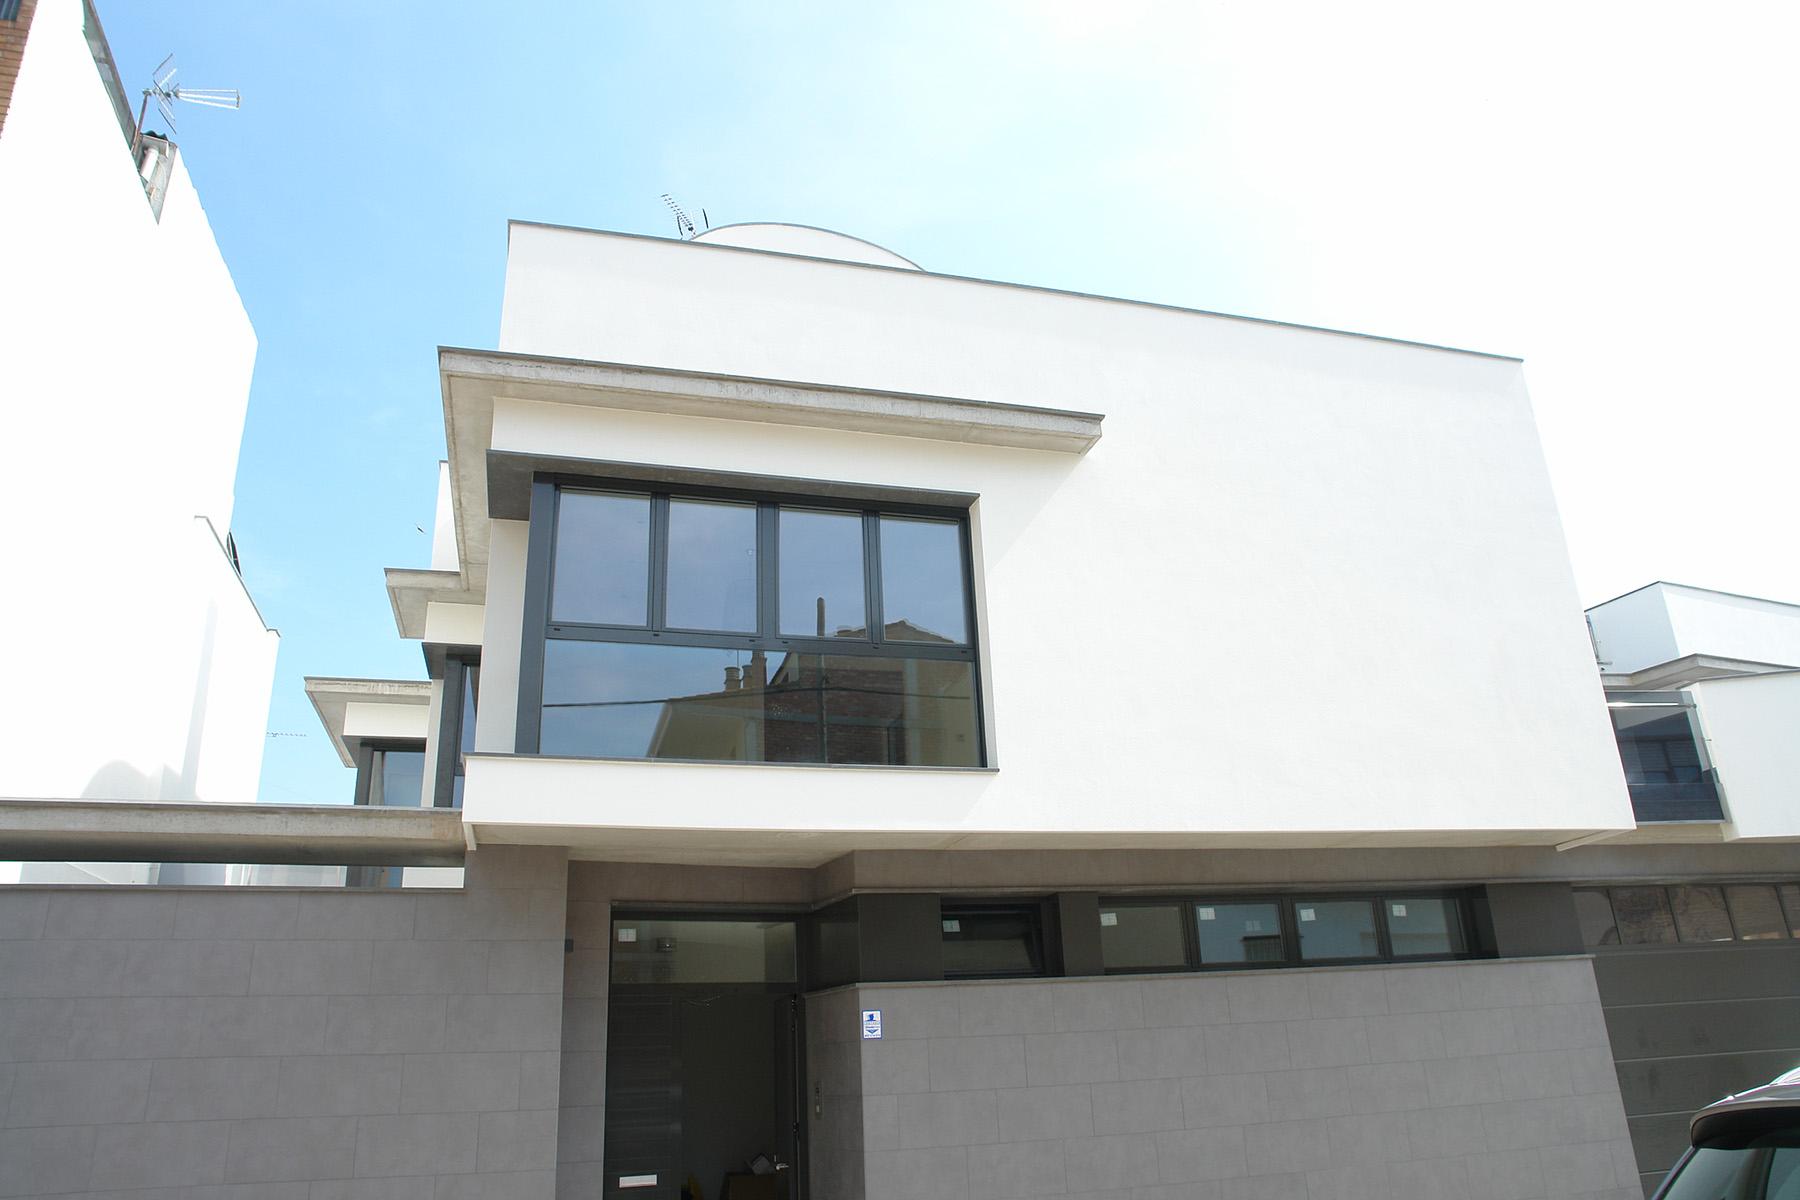 Galeria Casa en Binéfar, Huesca - 3 ?>